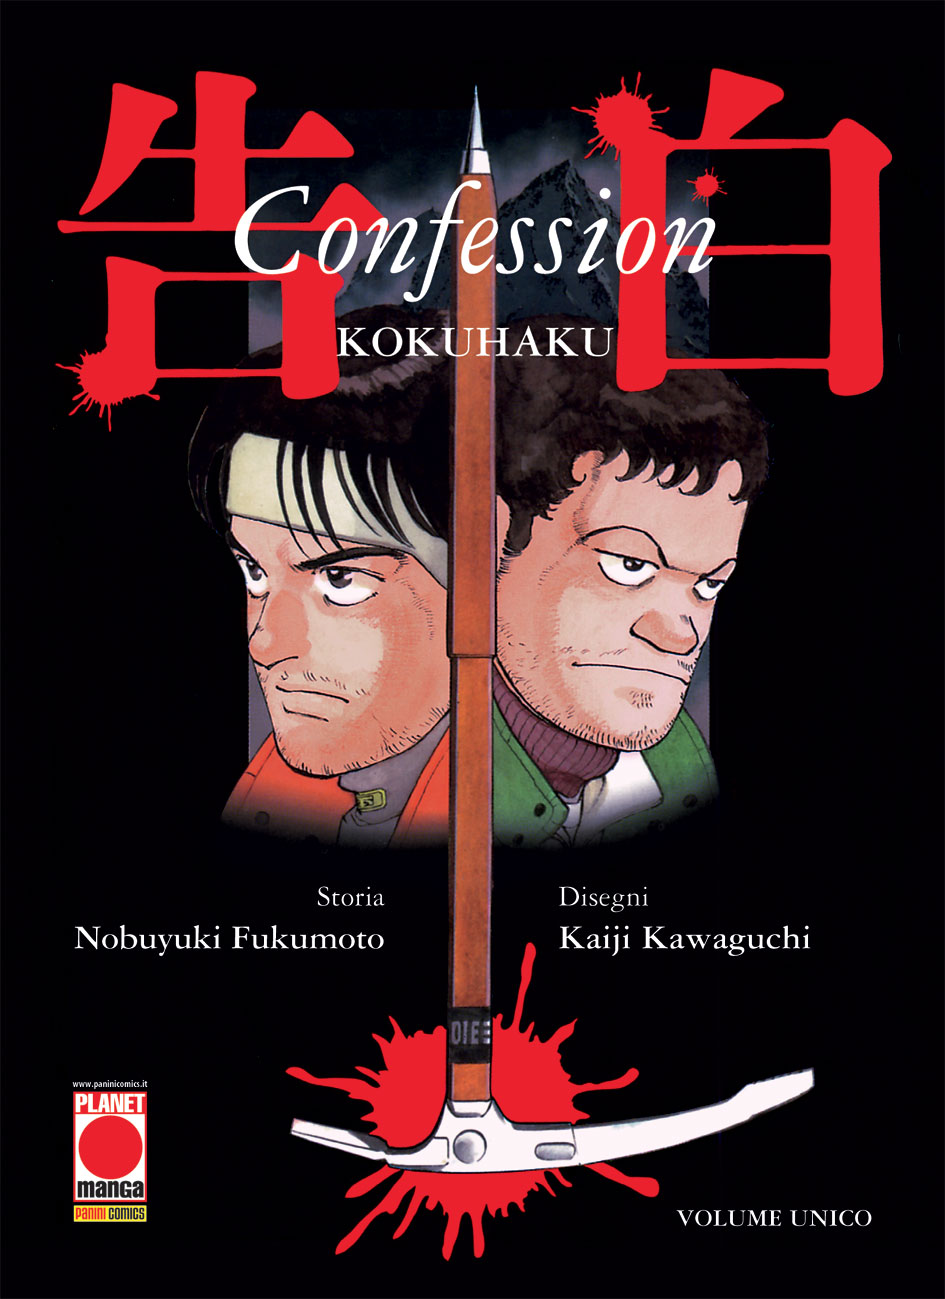 Kokuhaku - Confessio...